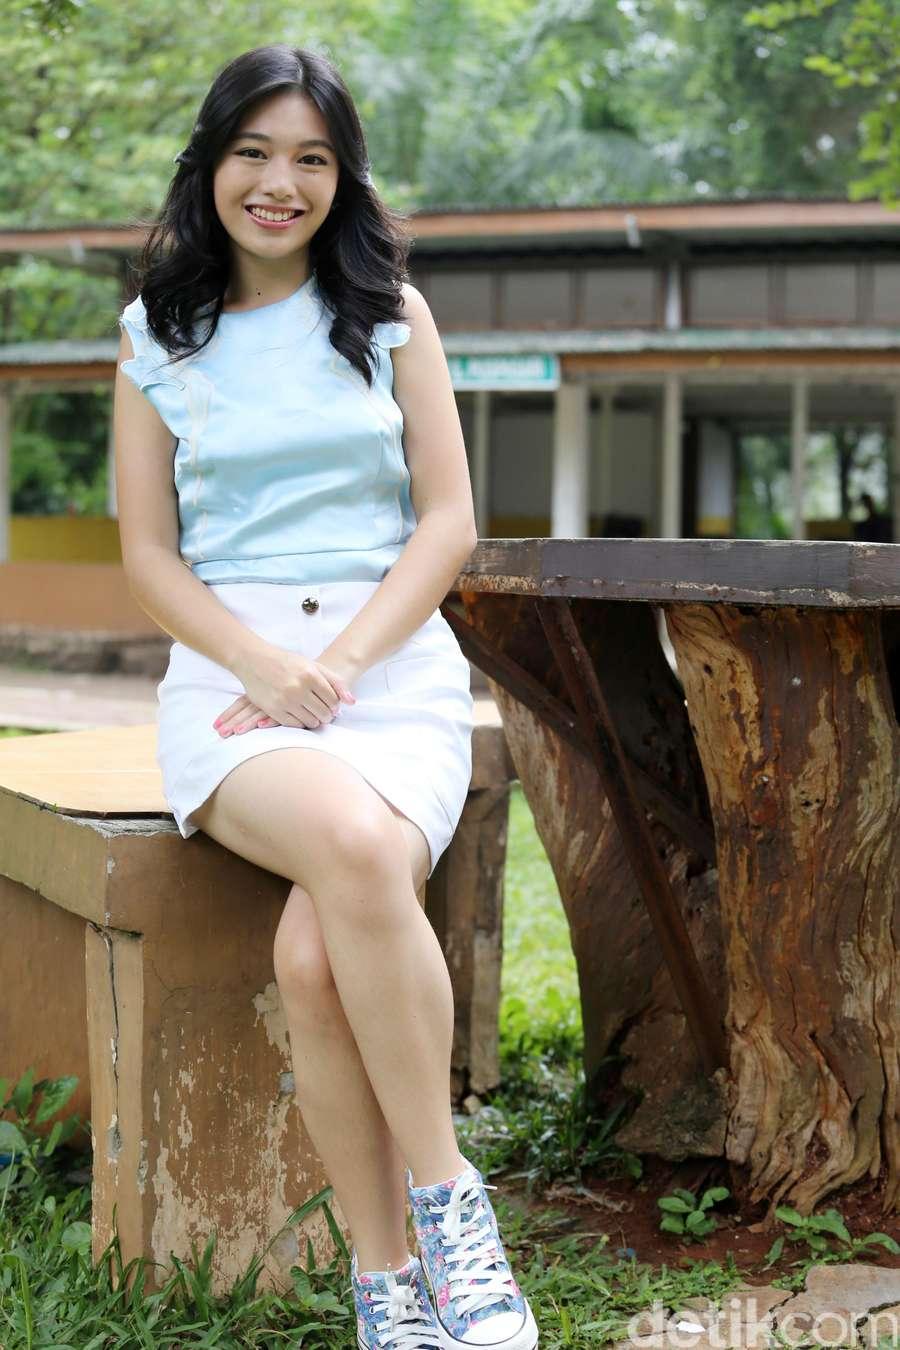 Claudy Putri, Si Cantik Tapi Medok